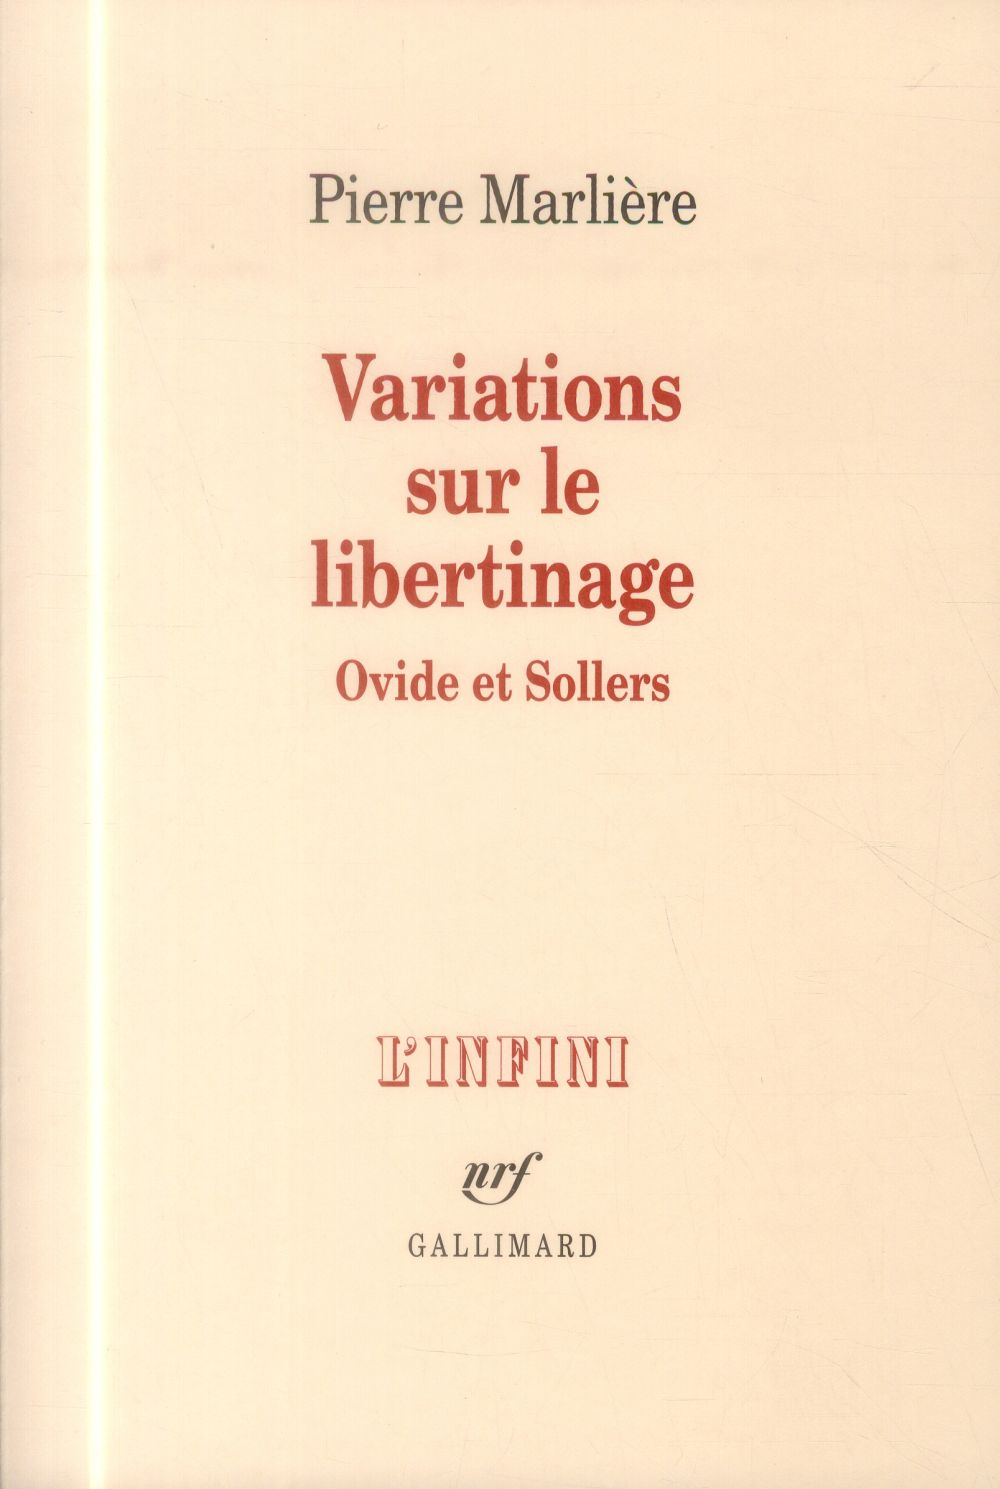 Variations sur le libertinage ; Ovide et Sollers